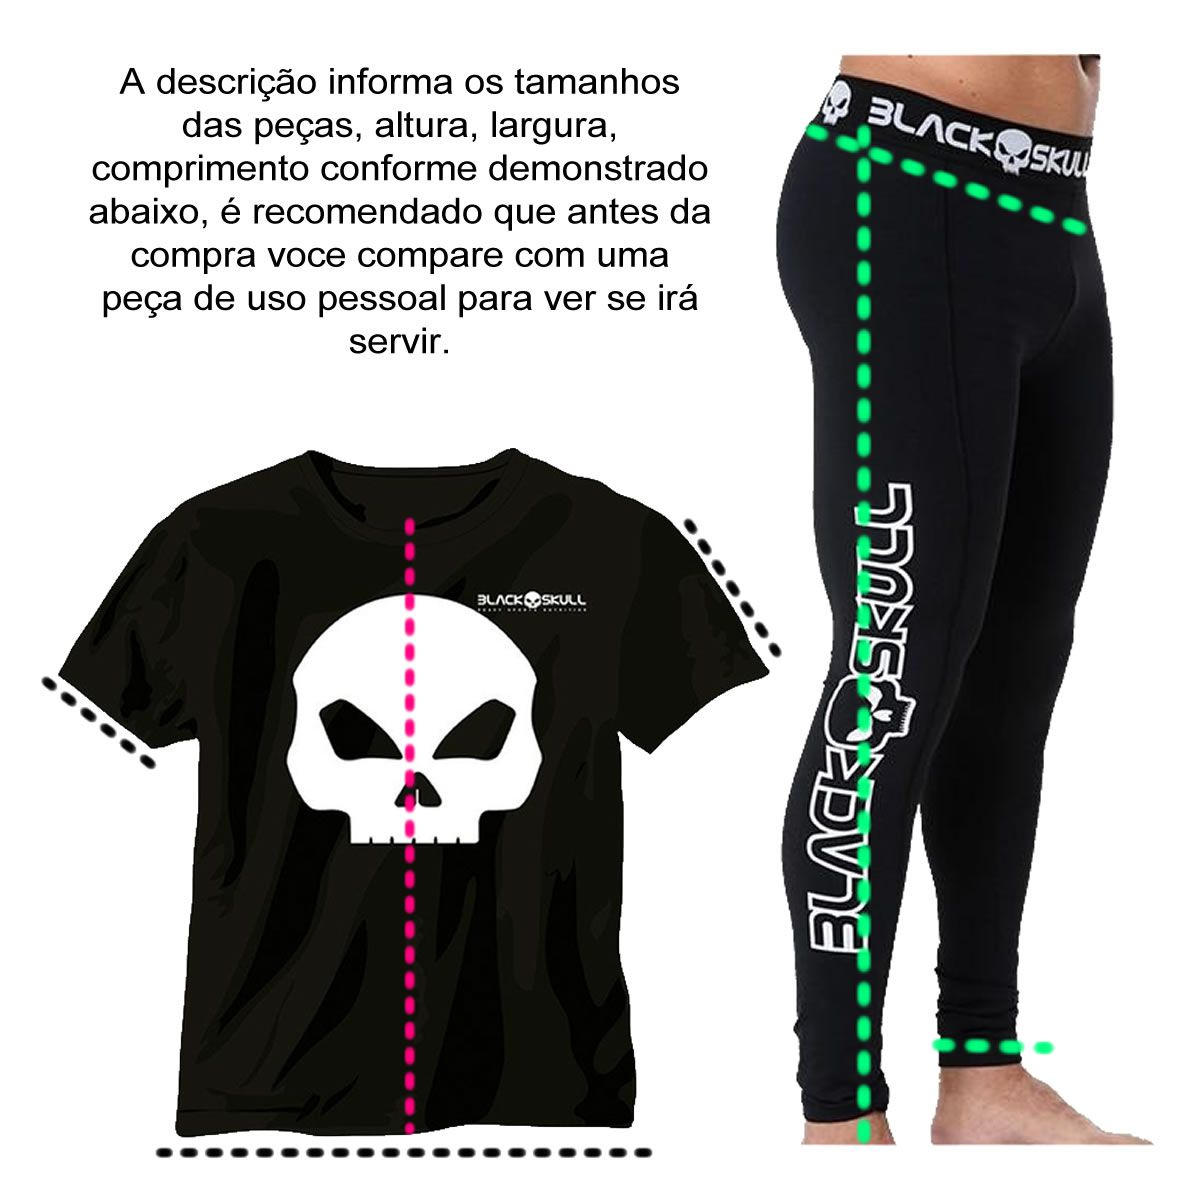 Legging Grind Preto - Black Skull